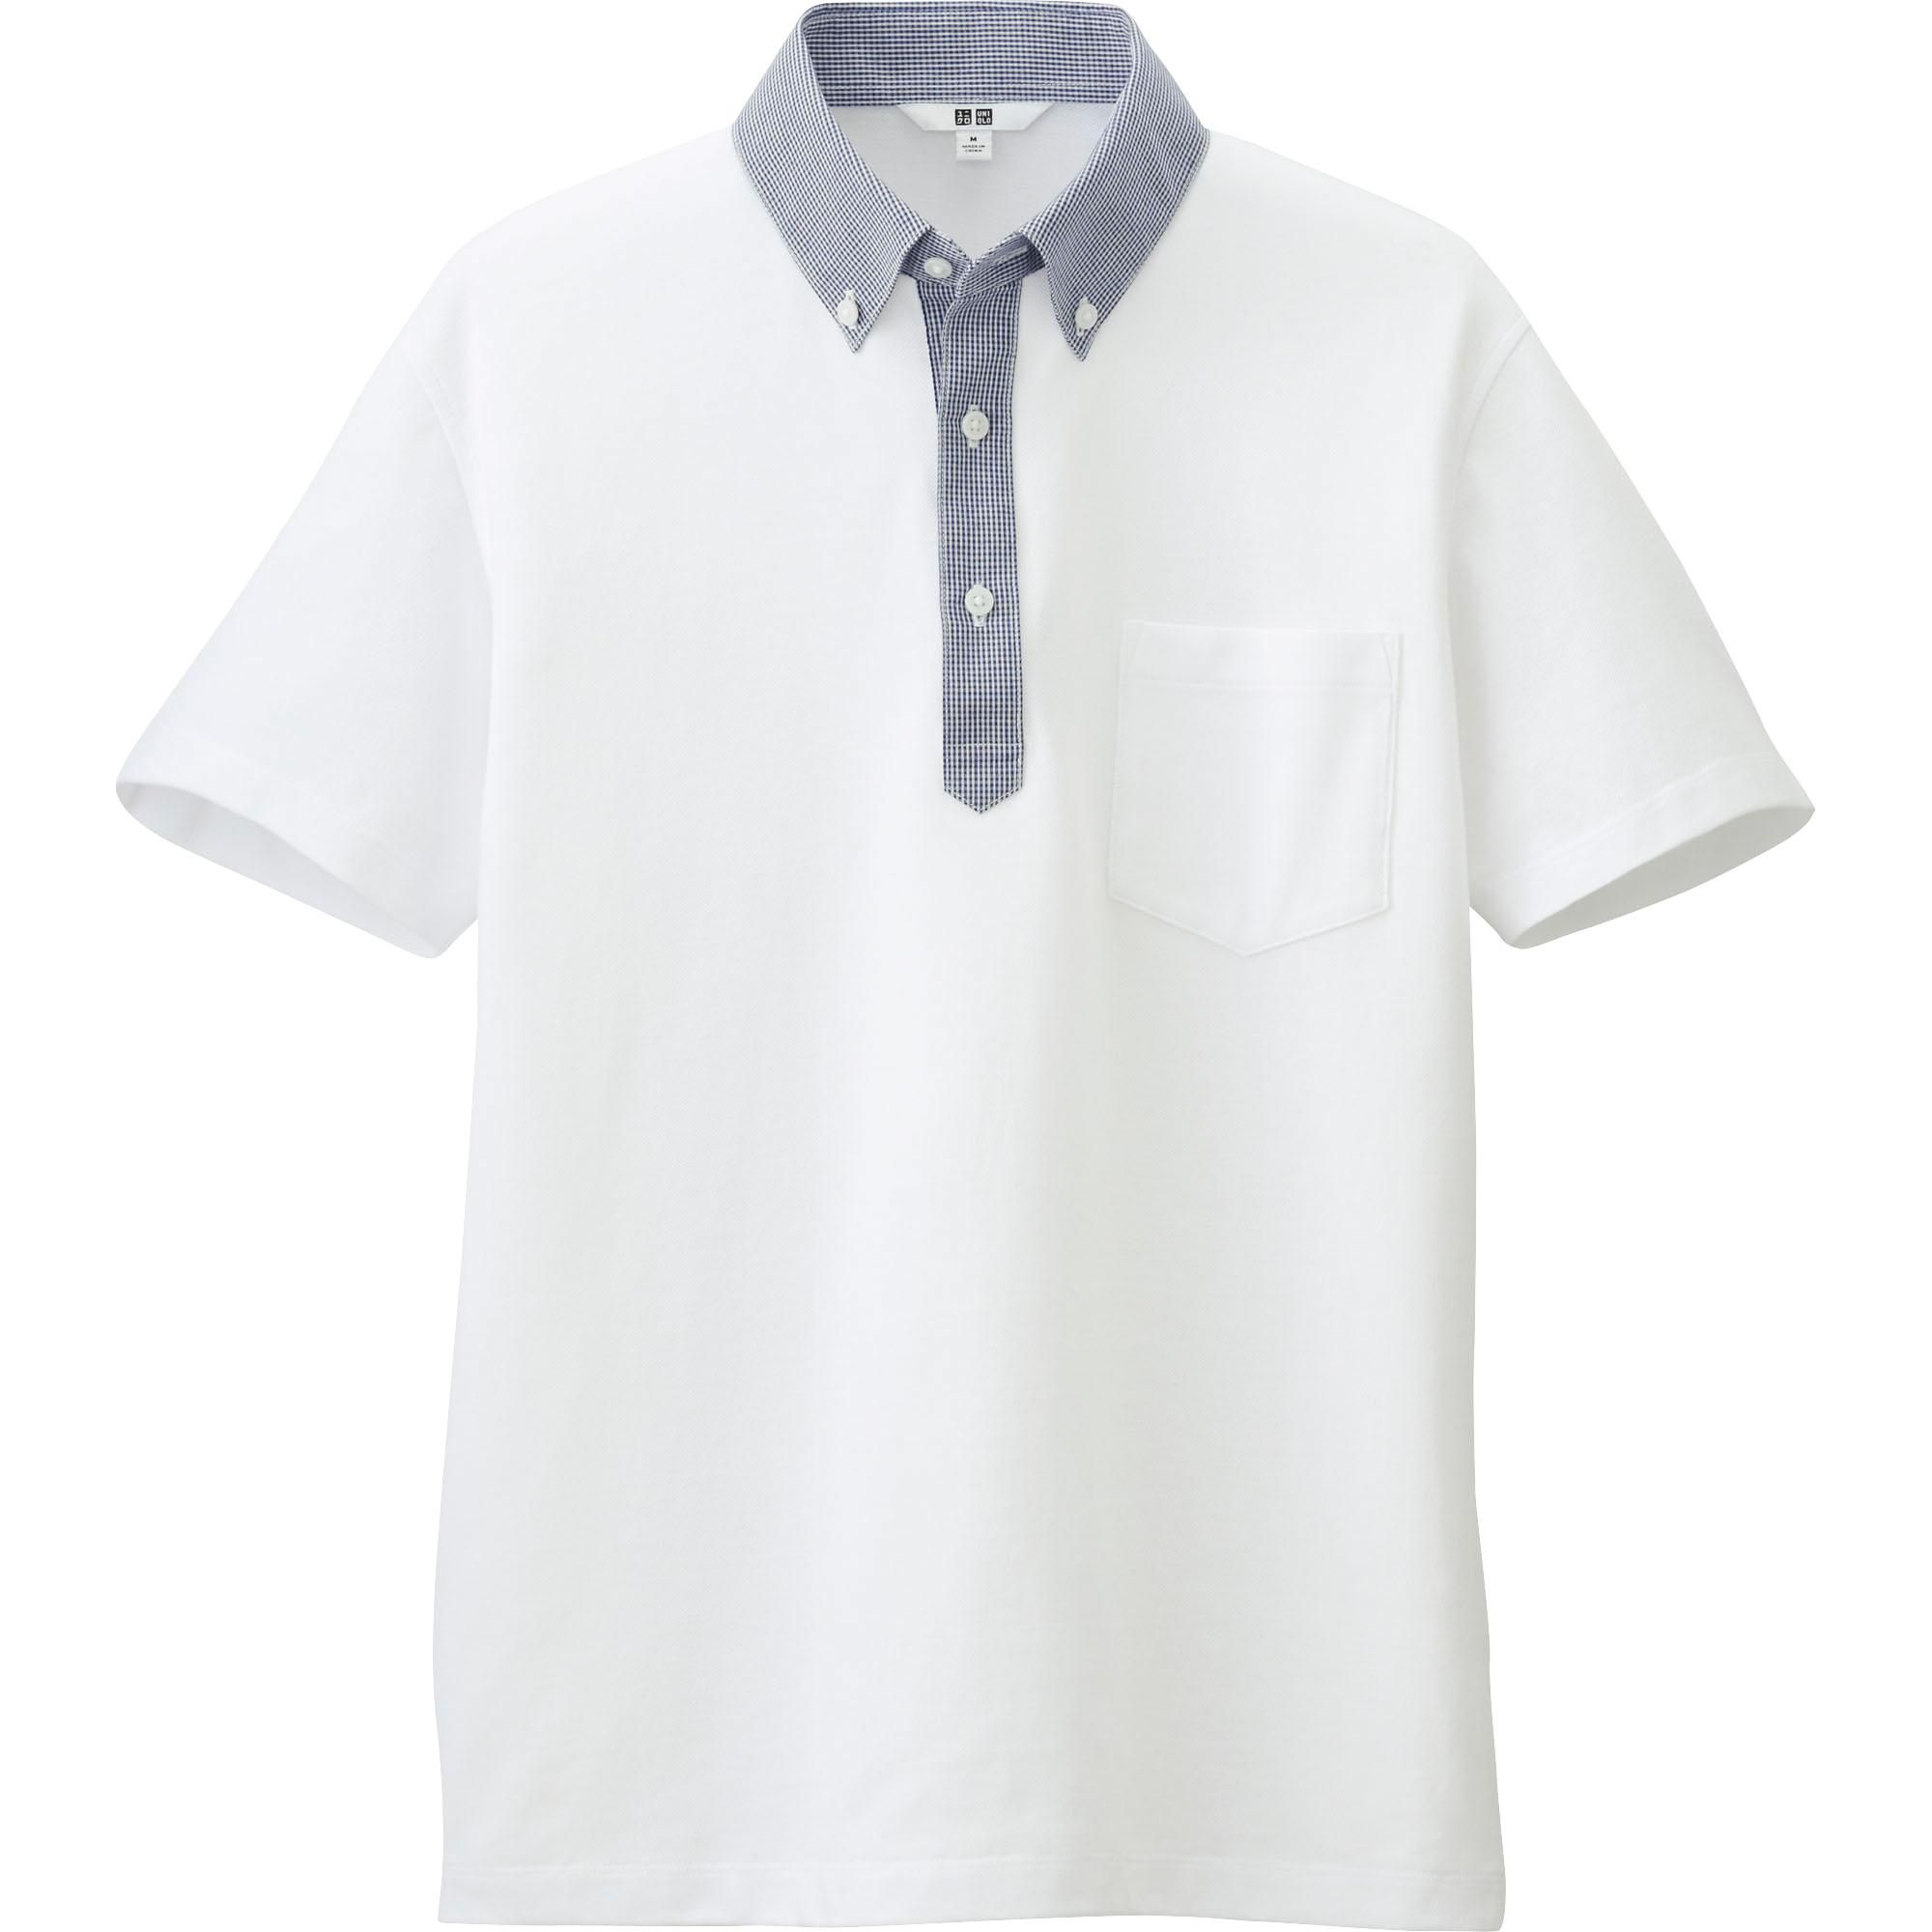 MEN DRY SHIRT COLLAR POLO SHIRT (BUTTON-DOWN)   UNIQLO   Shirts ...